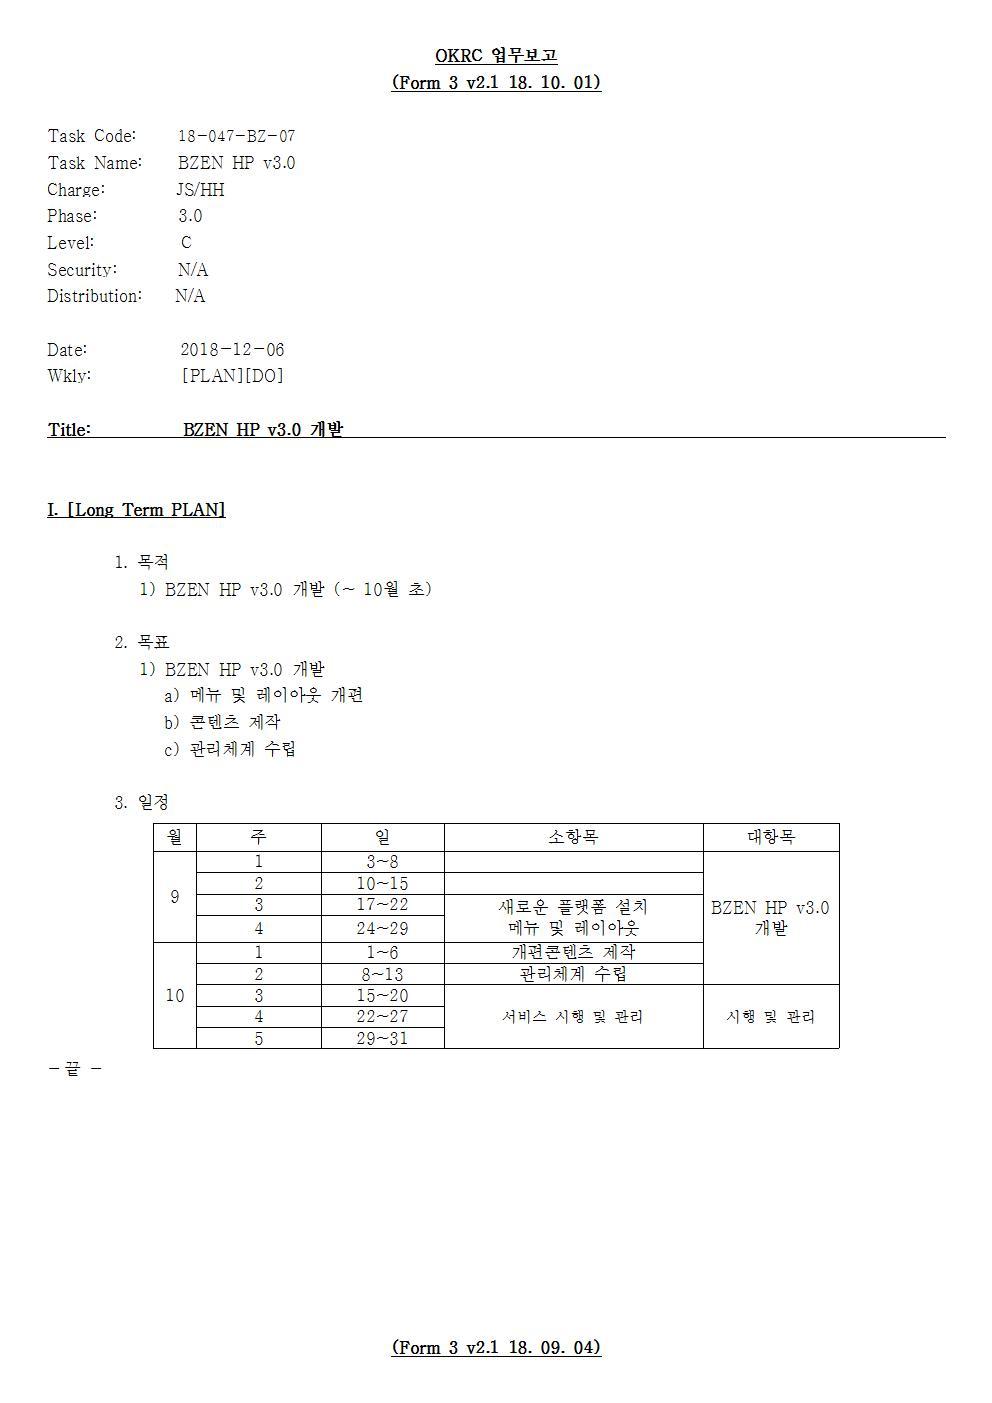 D-[18-047-BZ-07]-[BZEN HP v3.0]-[2018-12-06][HH]001.jpg